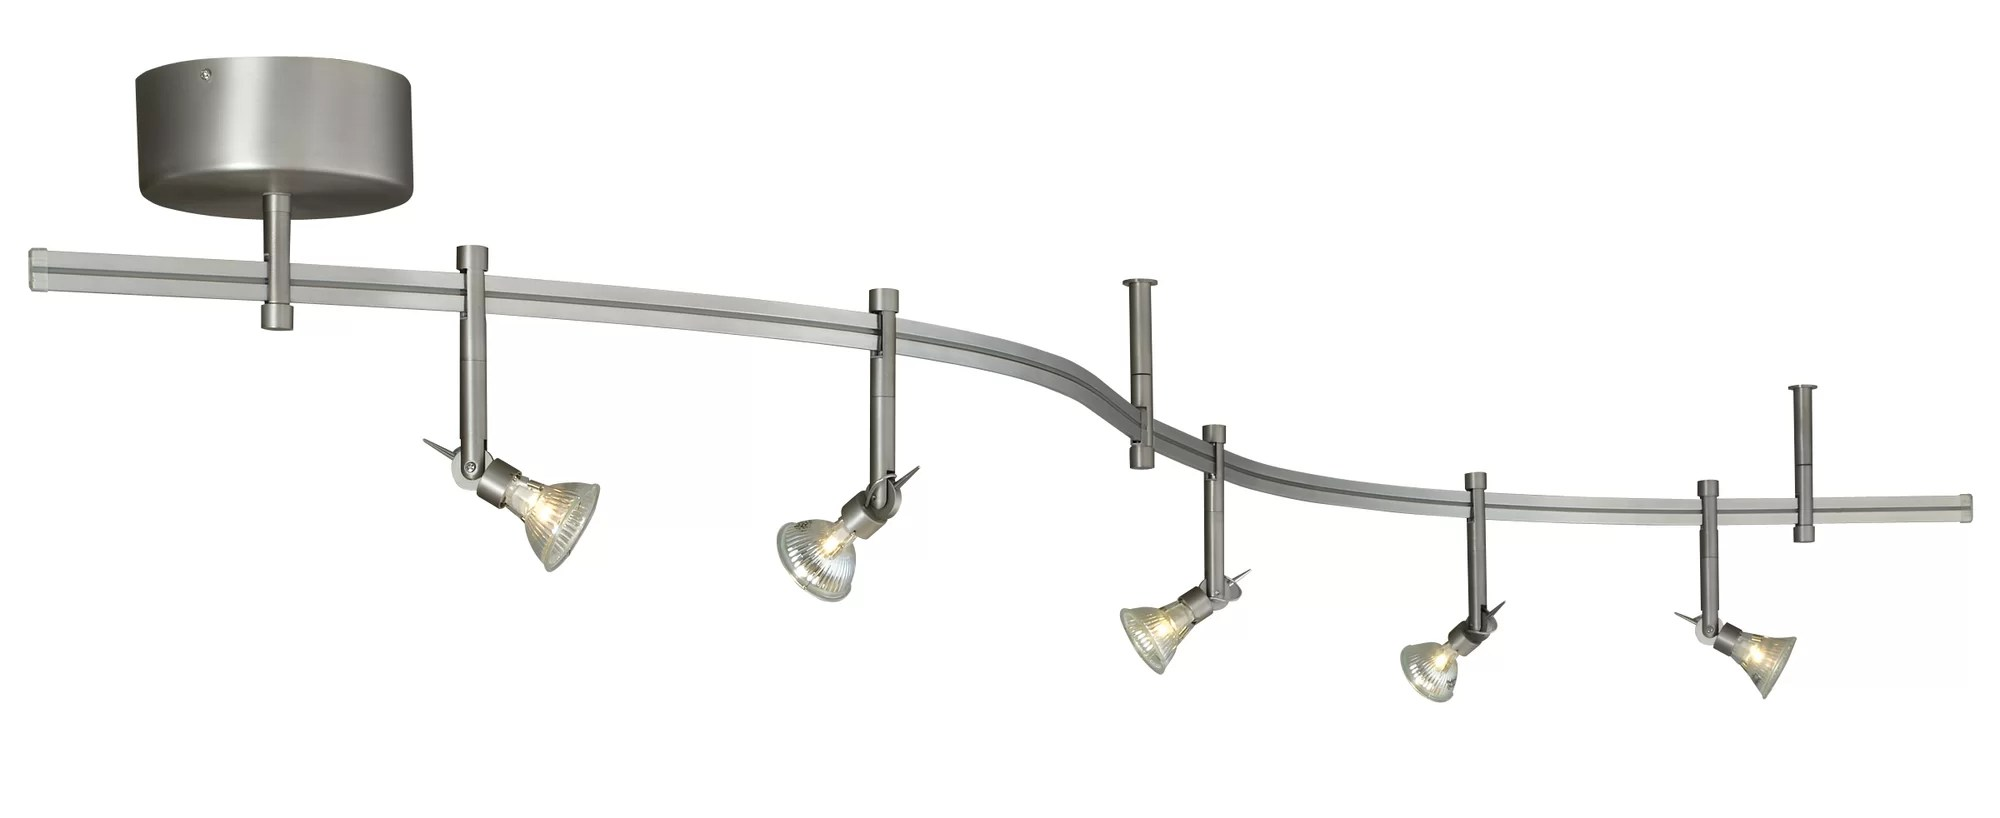 Tech Lighting Tiella 5 Light Decorative Flexible Track